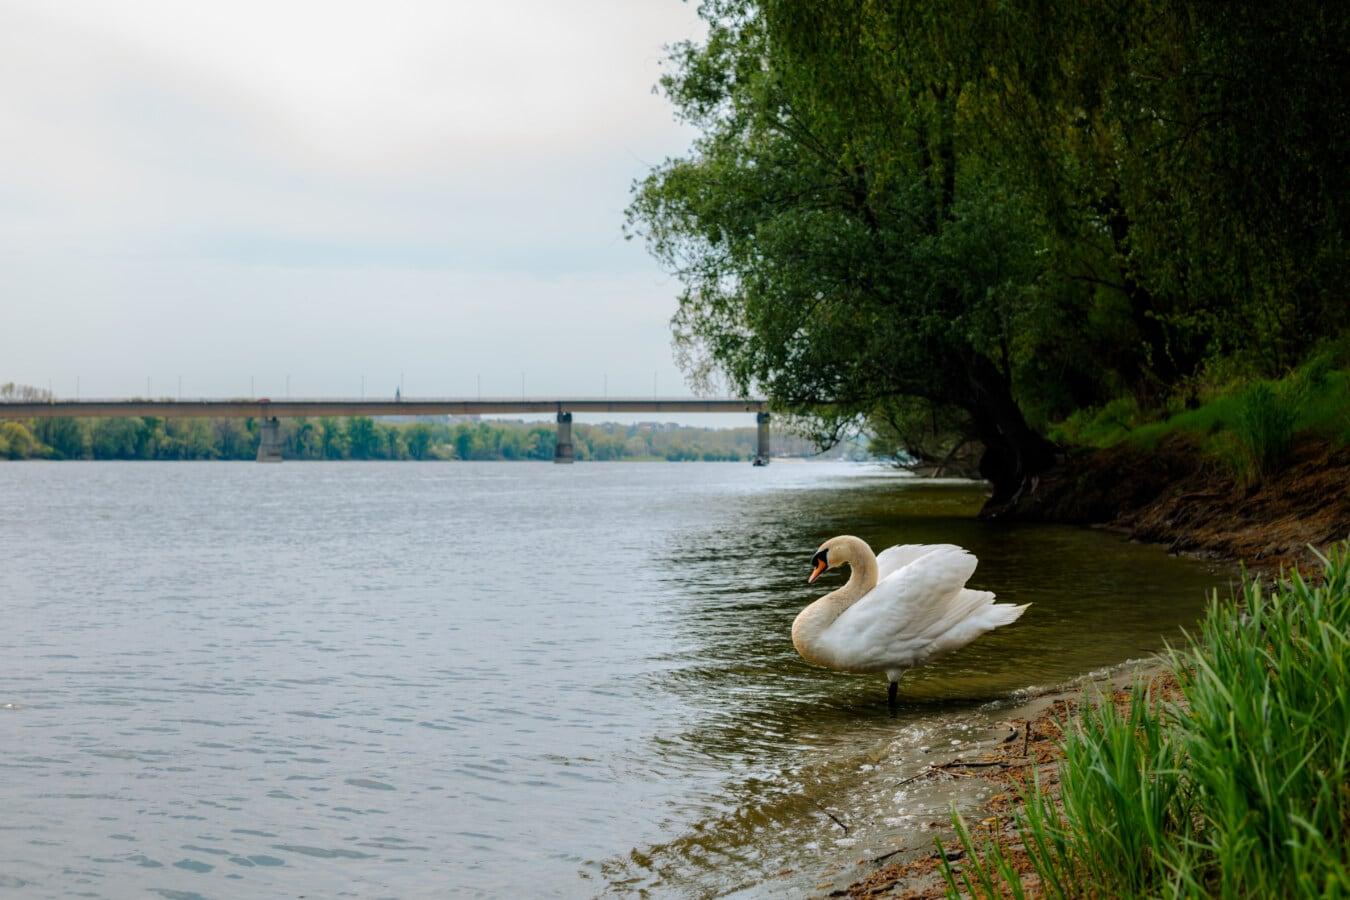 white, swan, side view, bird, riverbank, ecology, river, aquatic bird, water, lake